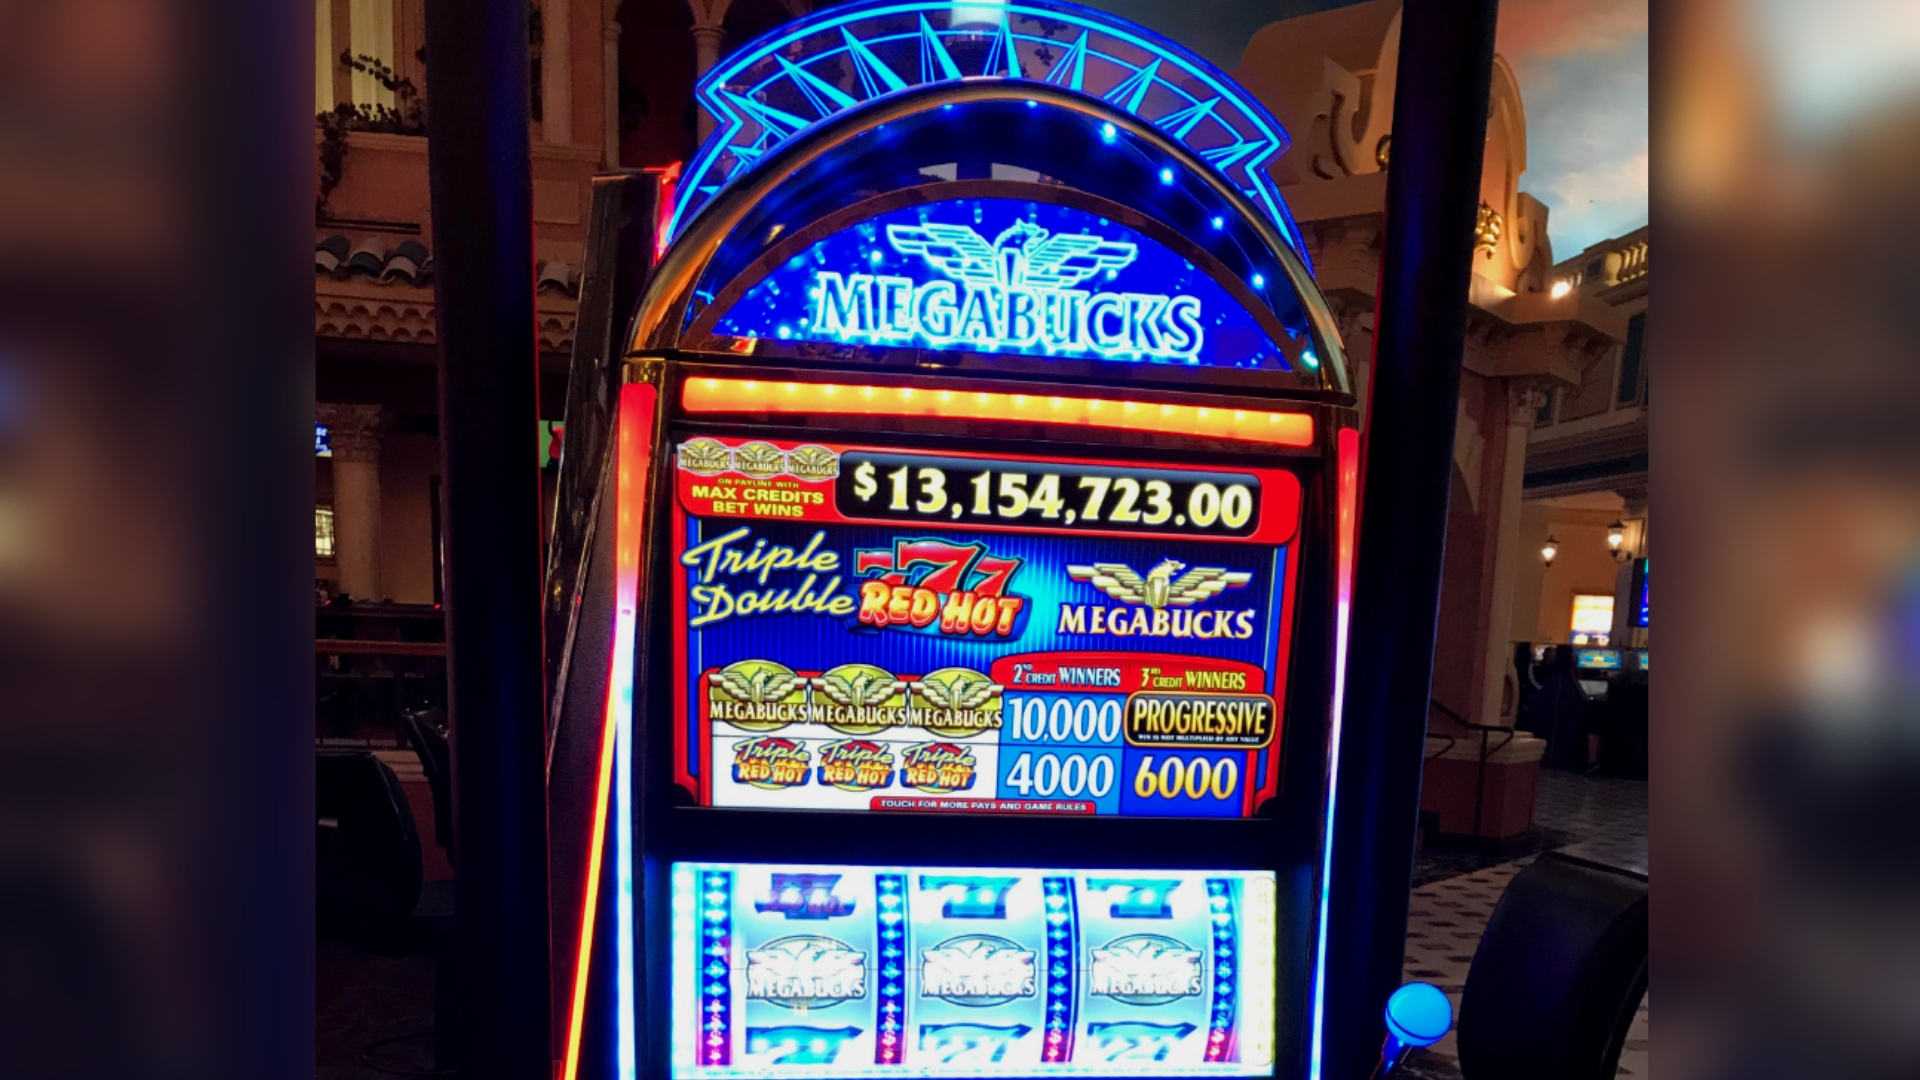 Igt mega jackpot winners nugget casino dayton nv